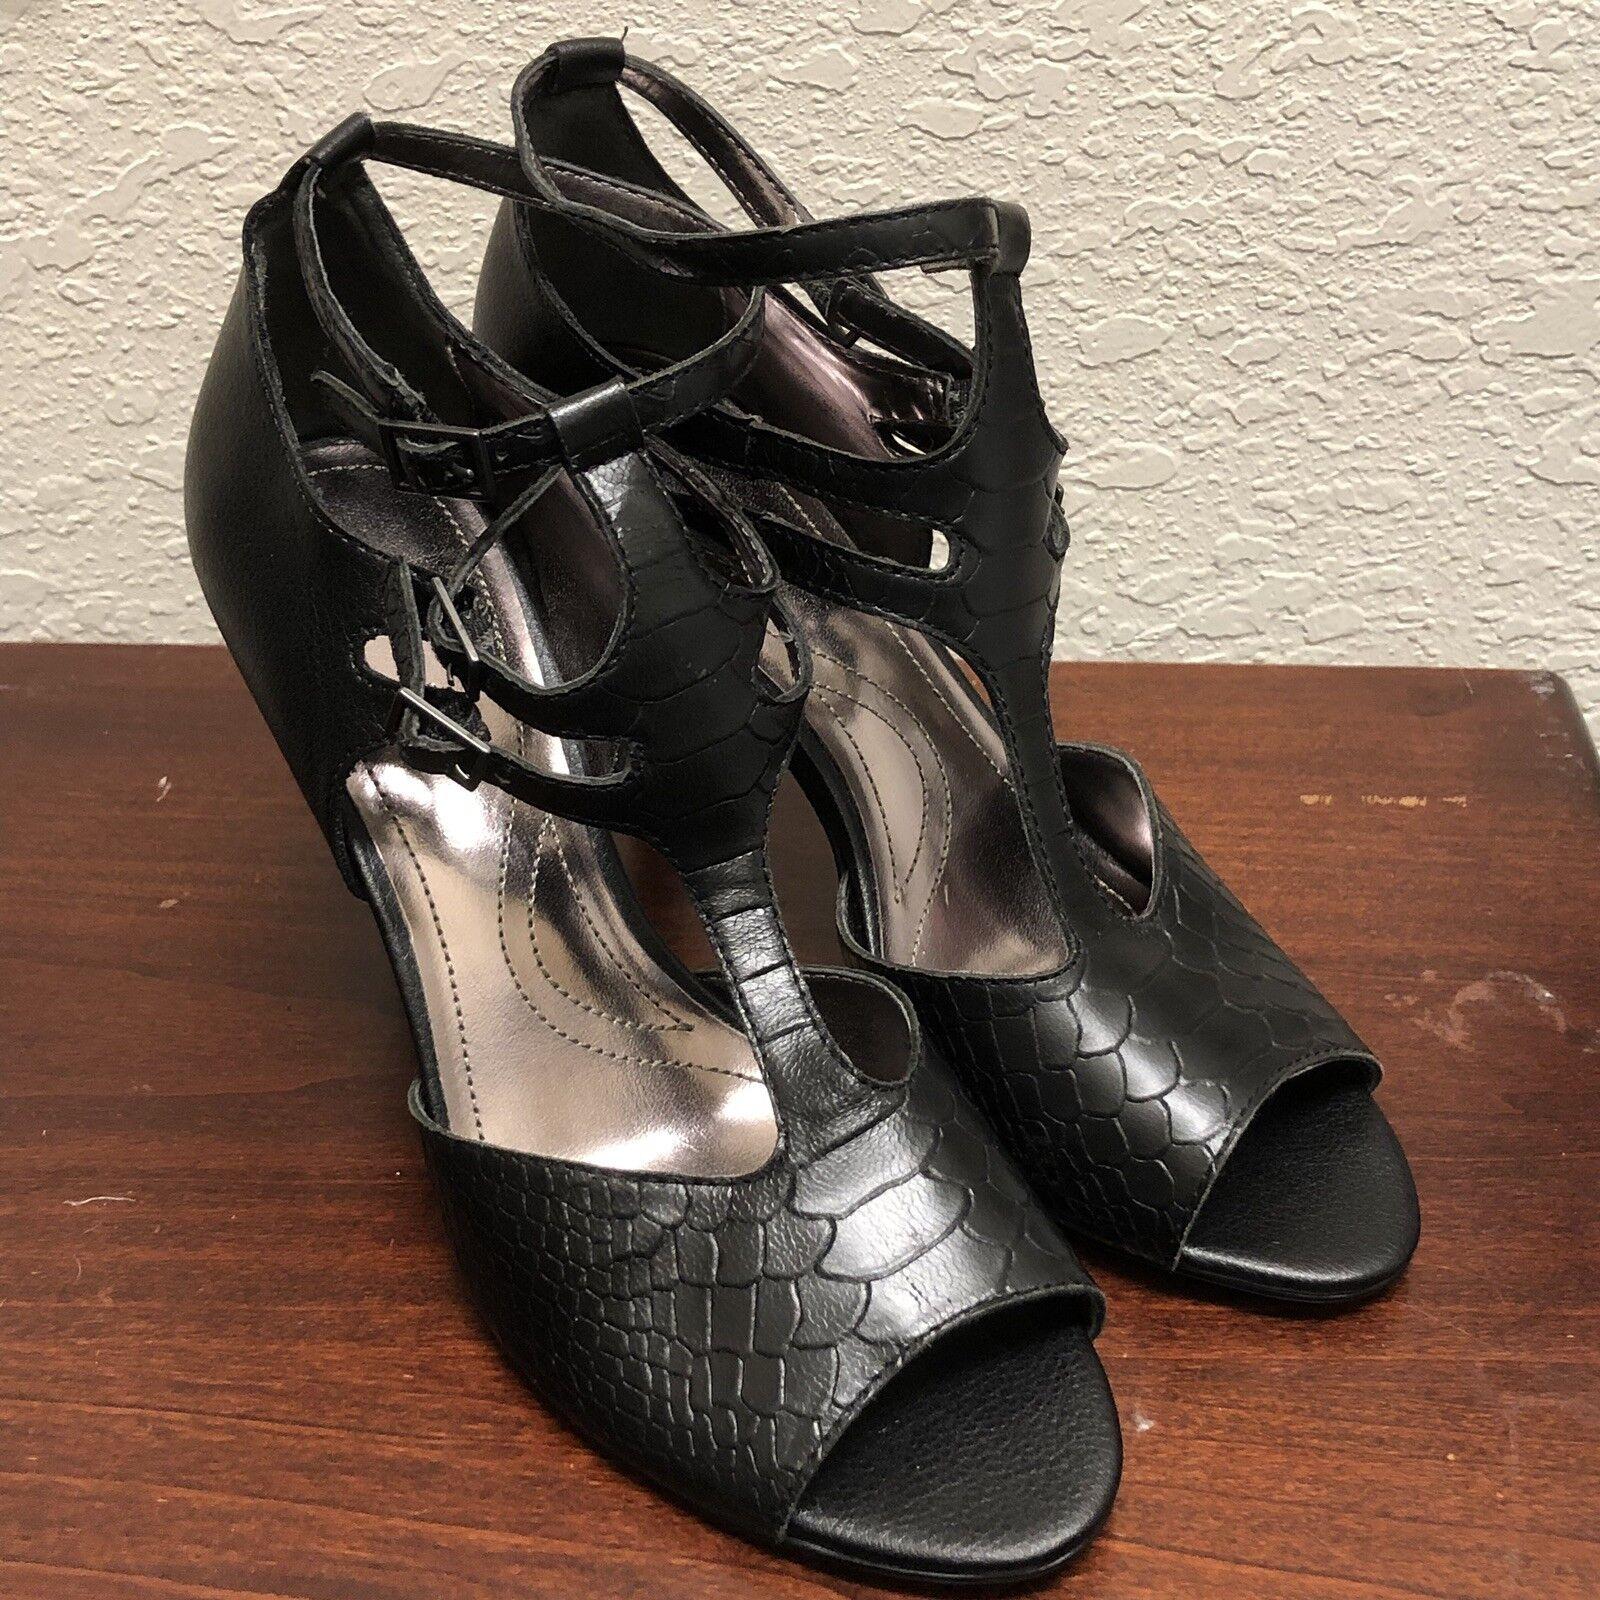 Tahari Women's shoes High Heels Sandals  New Warner Black Leather Size  9M  NWOB